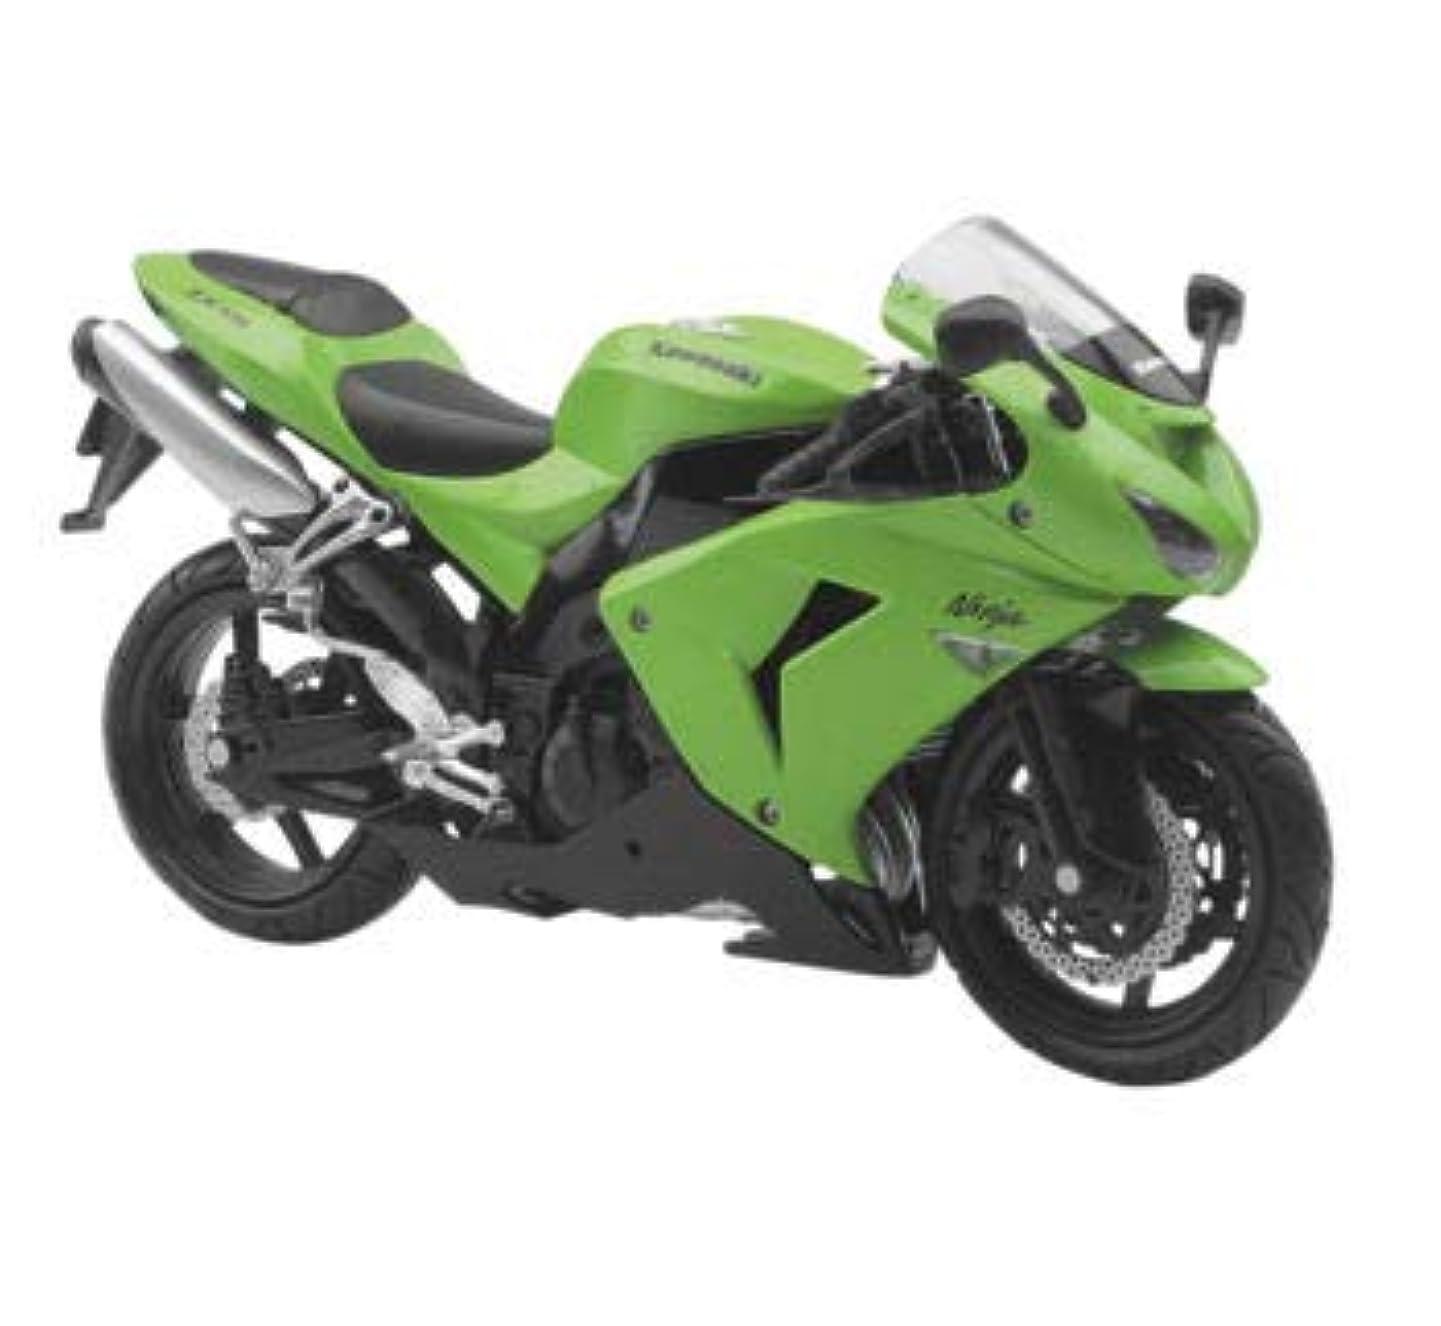 New Ray Toys 1:12 Scale Sport Bike Die-Cast Replica Kawasaki 2006 ZX-10R 42443A